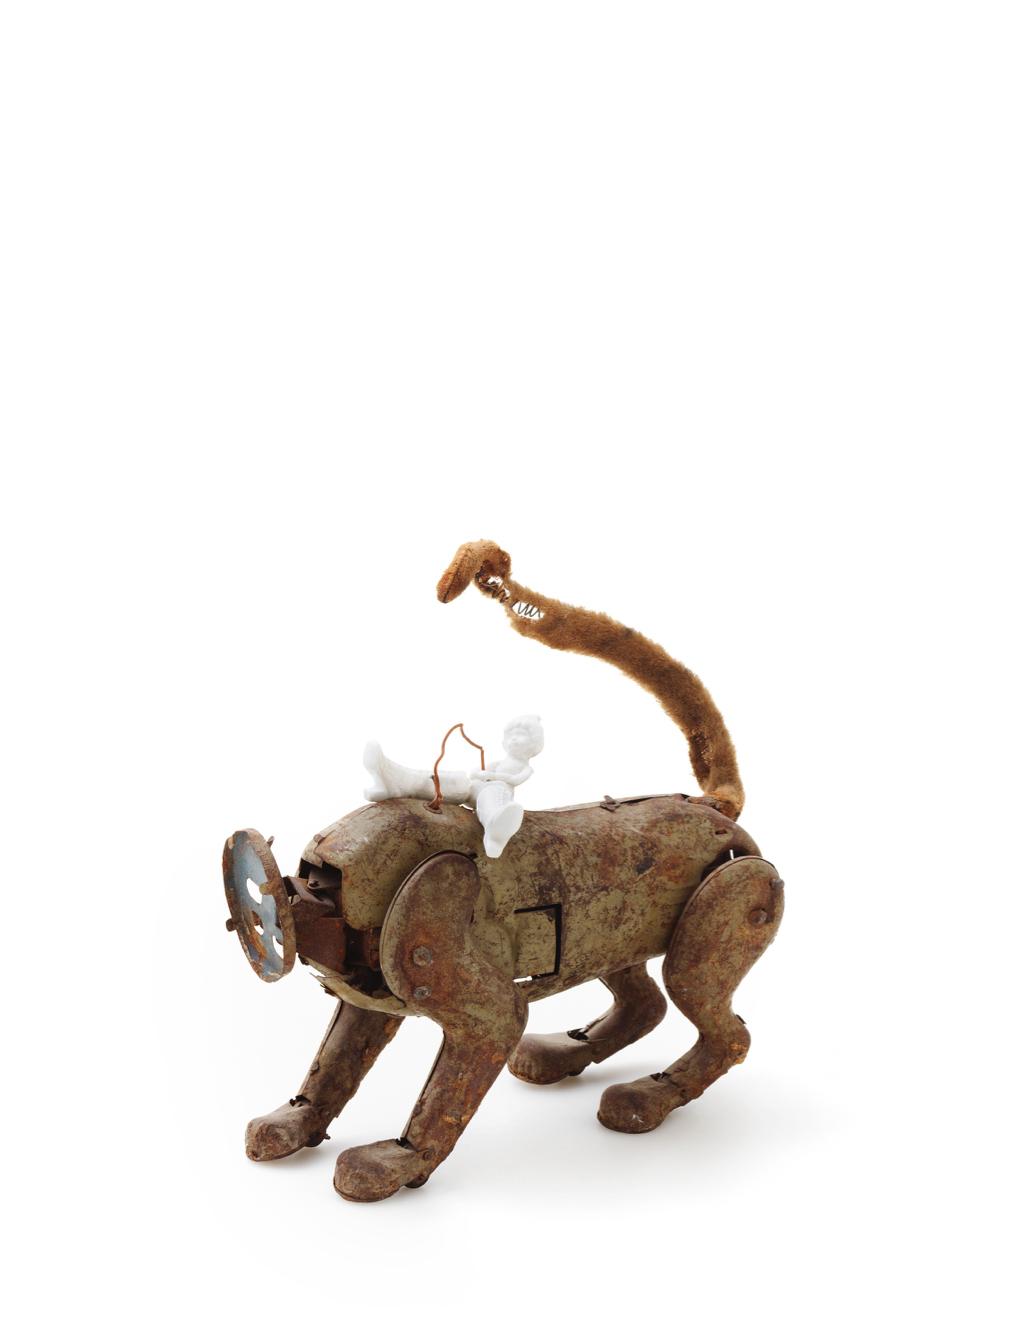 Kyriaki Mavrogeorgi, Escape -Thank you for the day, Porcelain (metal toy), 24x23 cm, 2019,Courtesy of Gallery Genesis